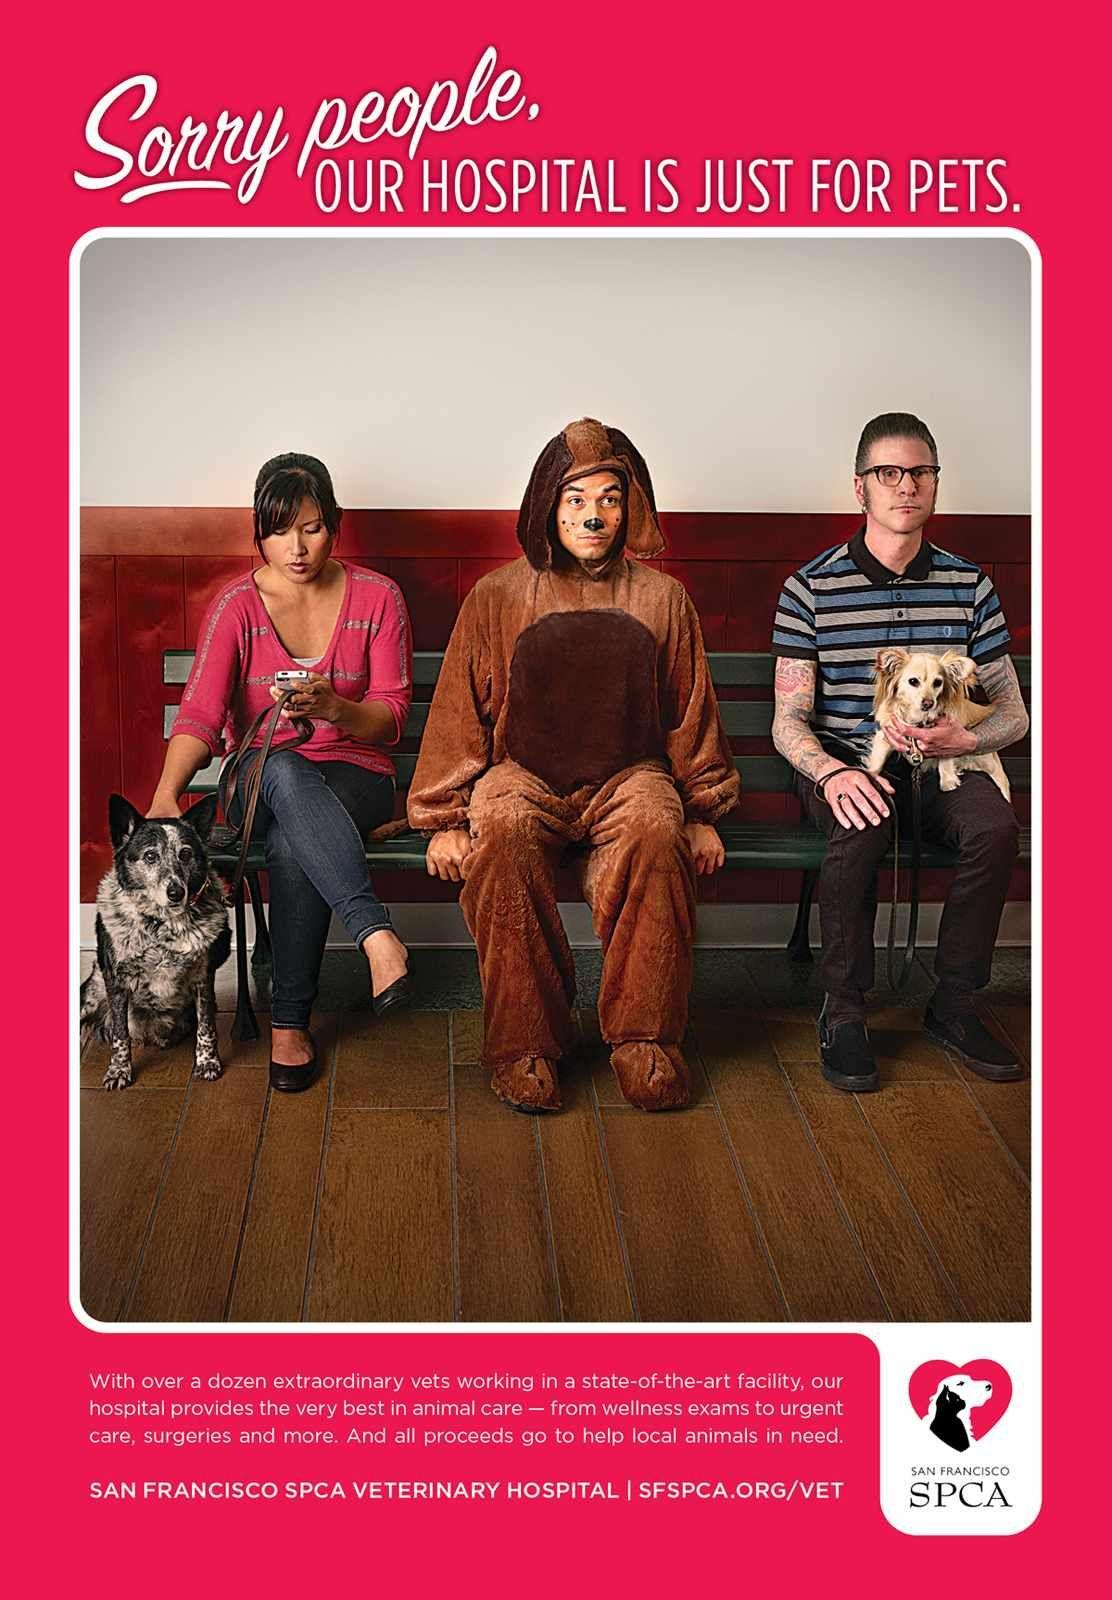 San Francisco SPCA Waiting Room Advertising, Funny ads